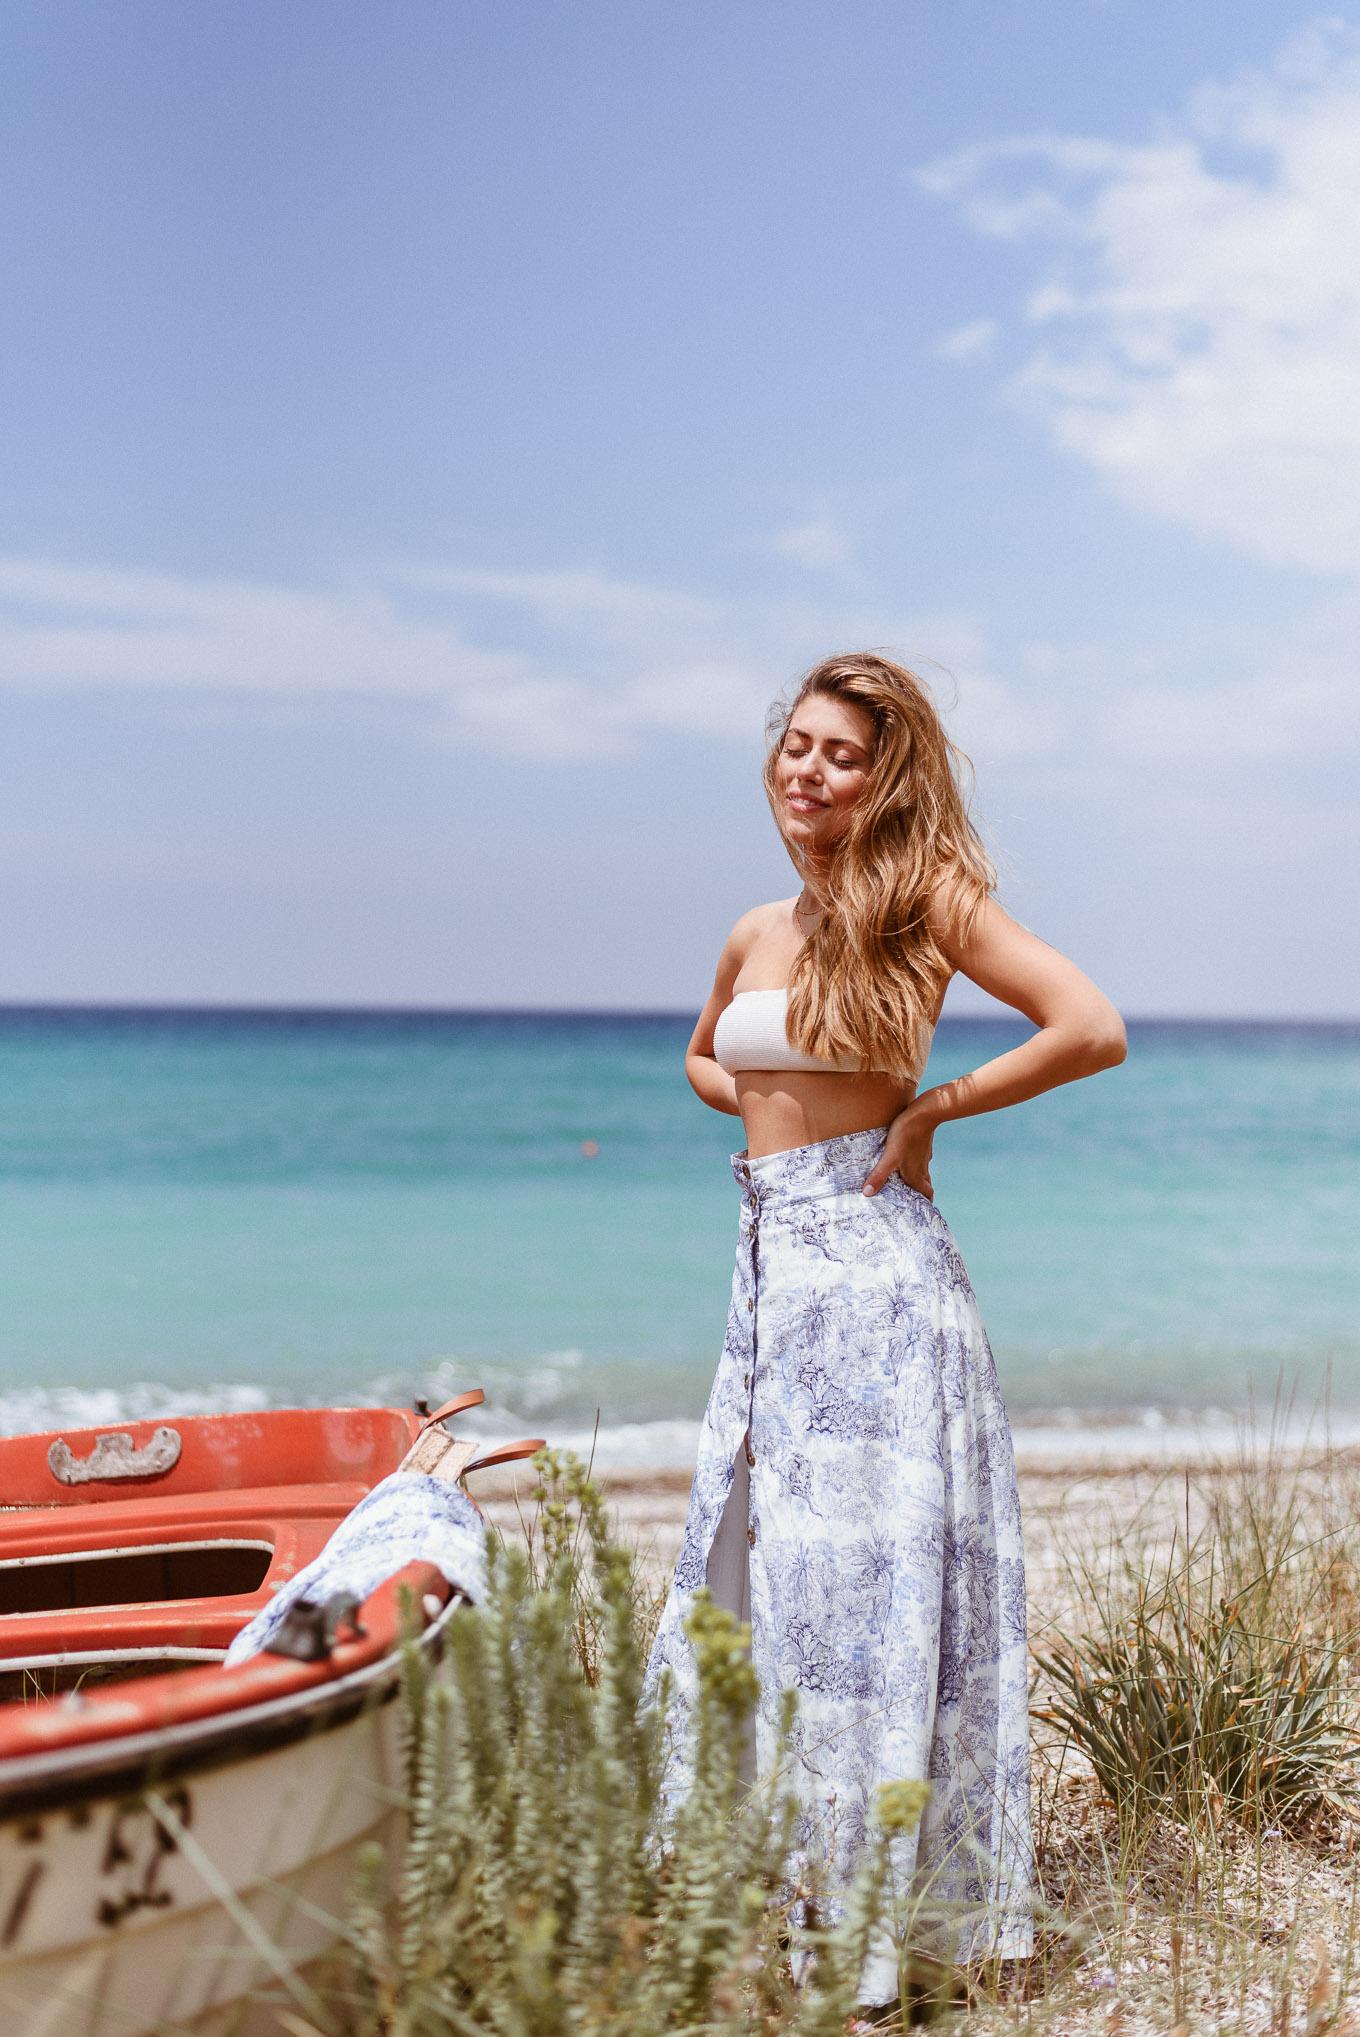 Beach style blogger wearing bikini